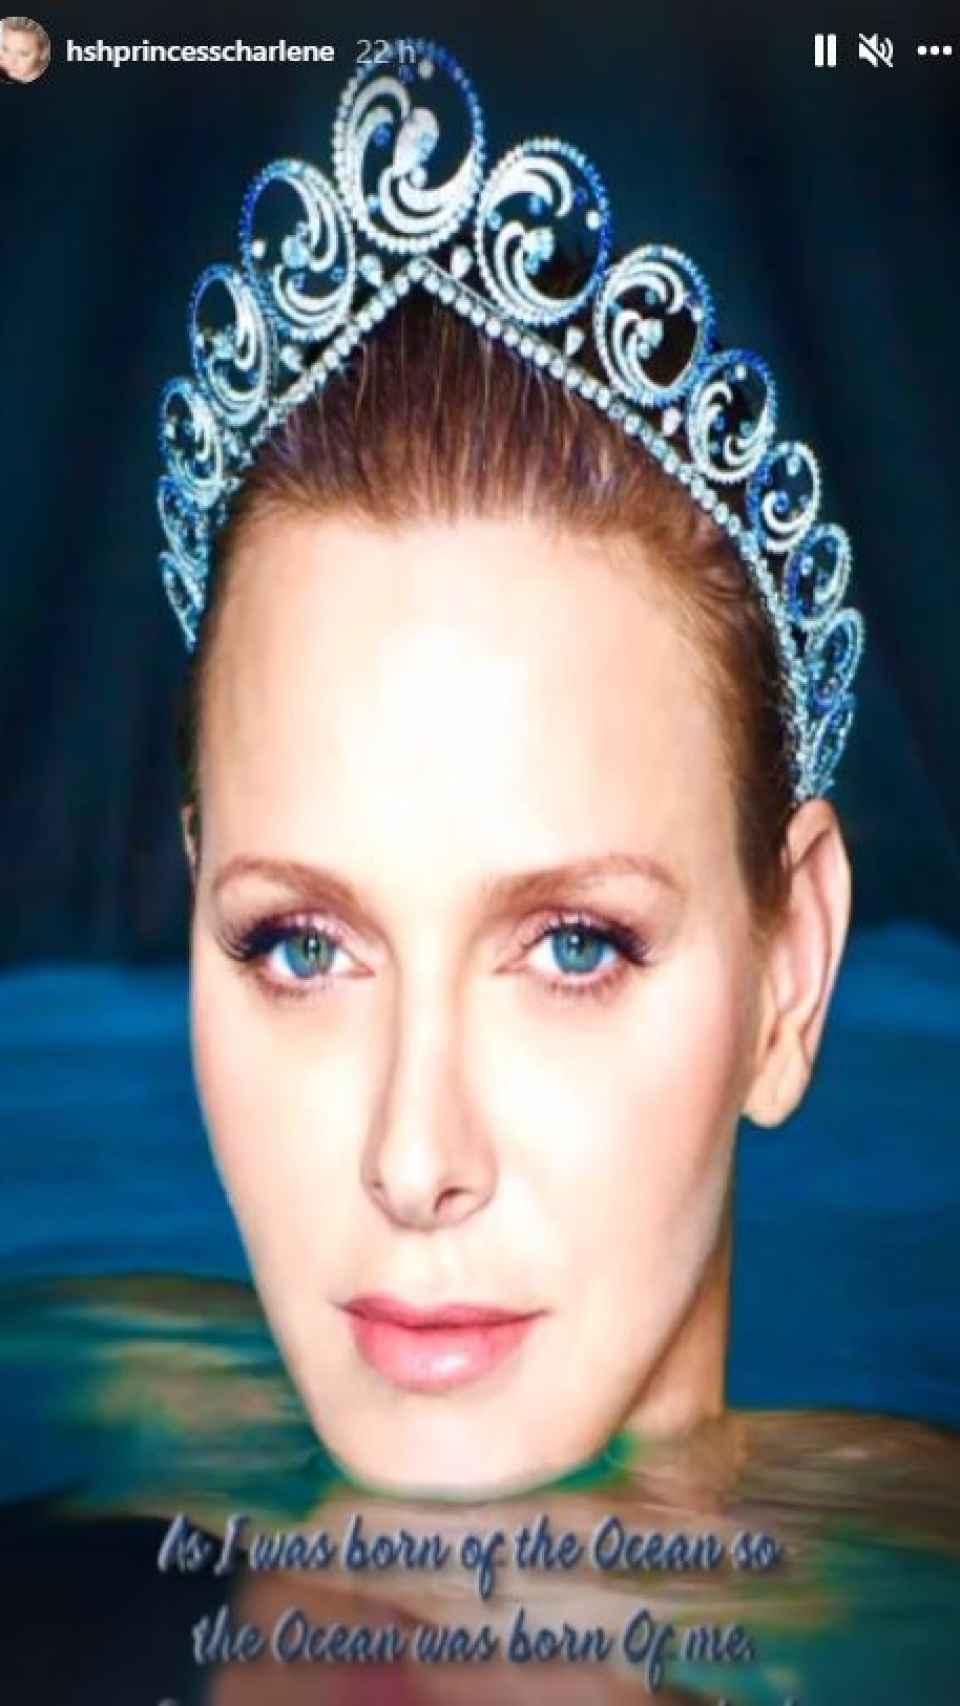 La princesa Charlène ha mandado un emotivo mensaje en honor a la gala de Salud Planetaria.